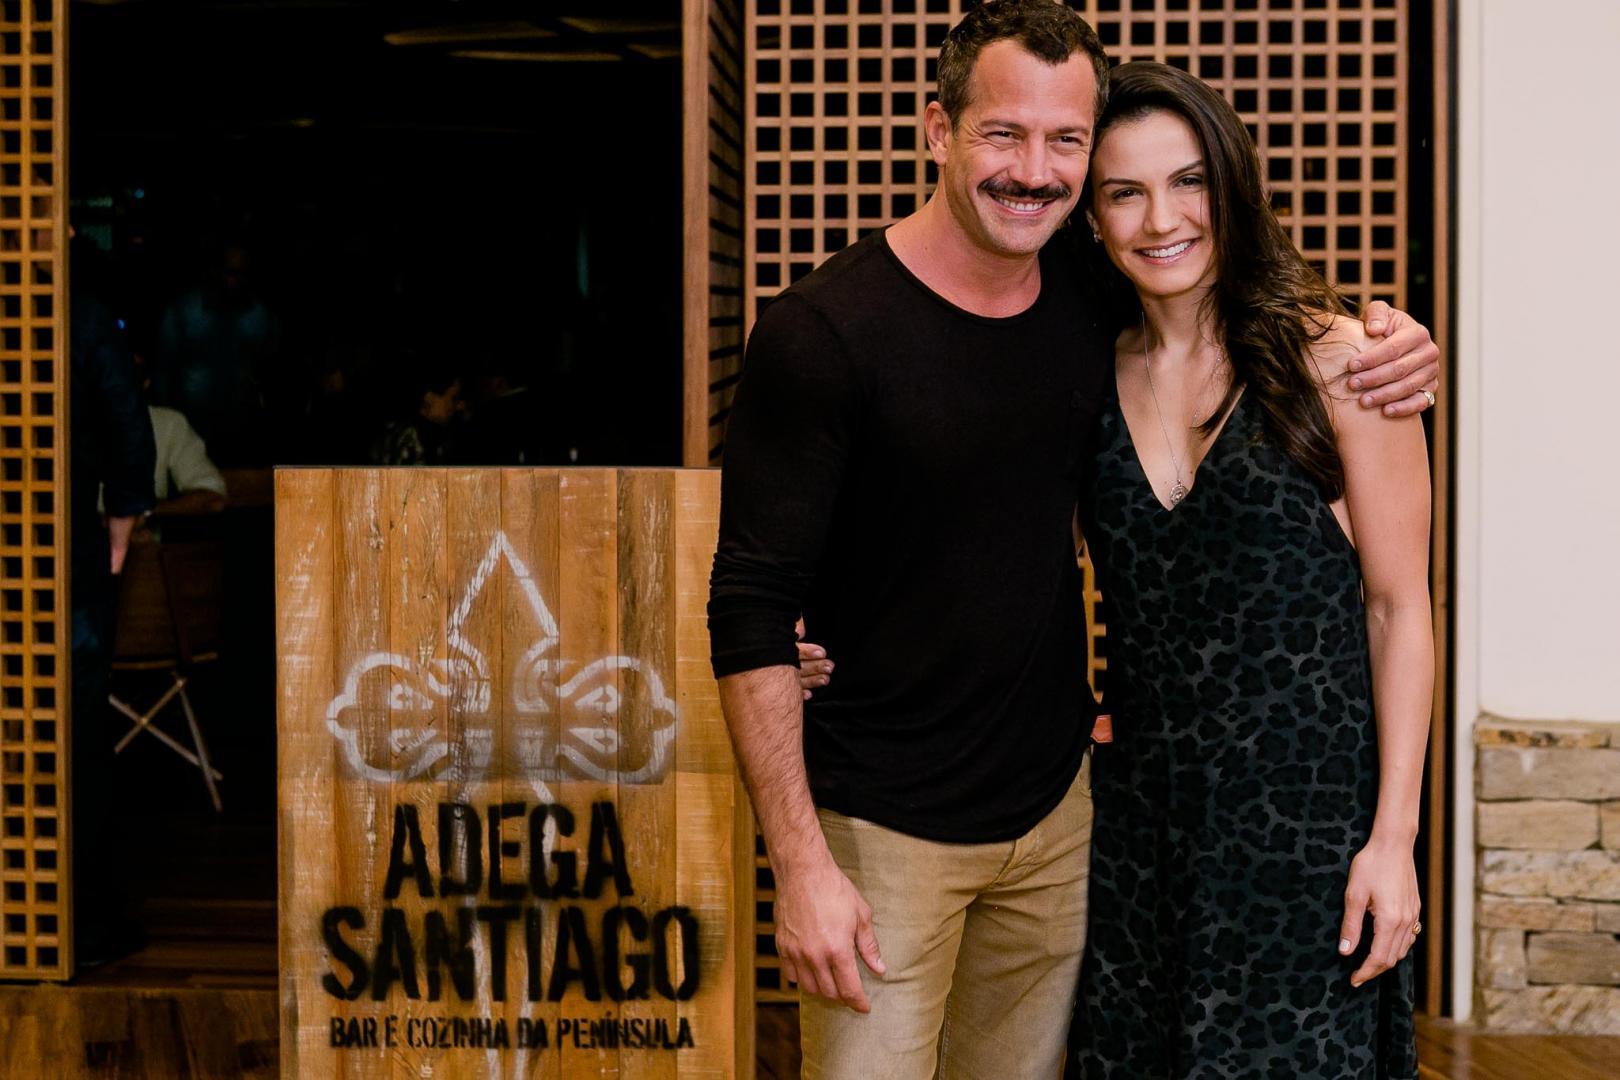 Adega Santiago abre no Village Mall